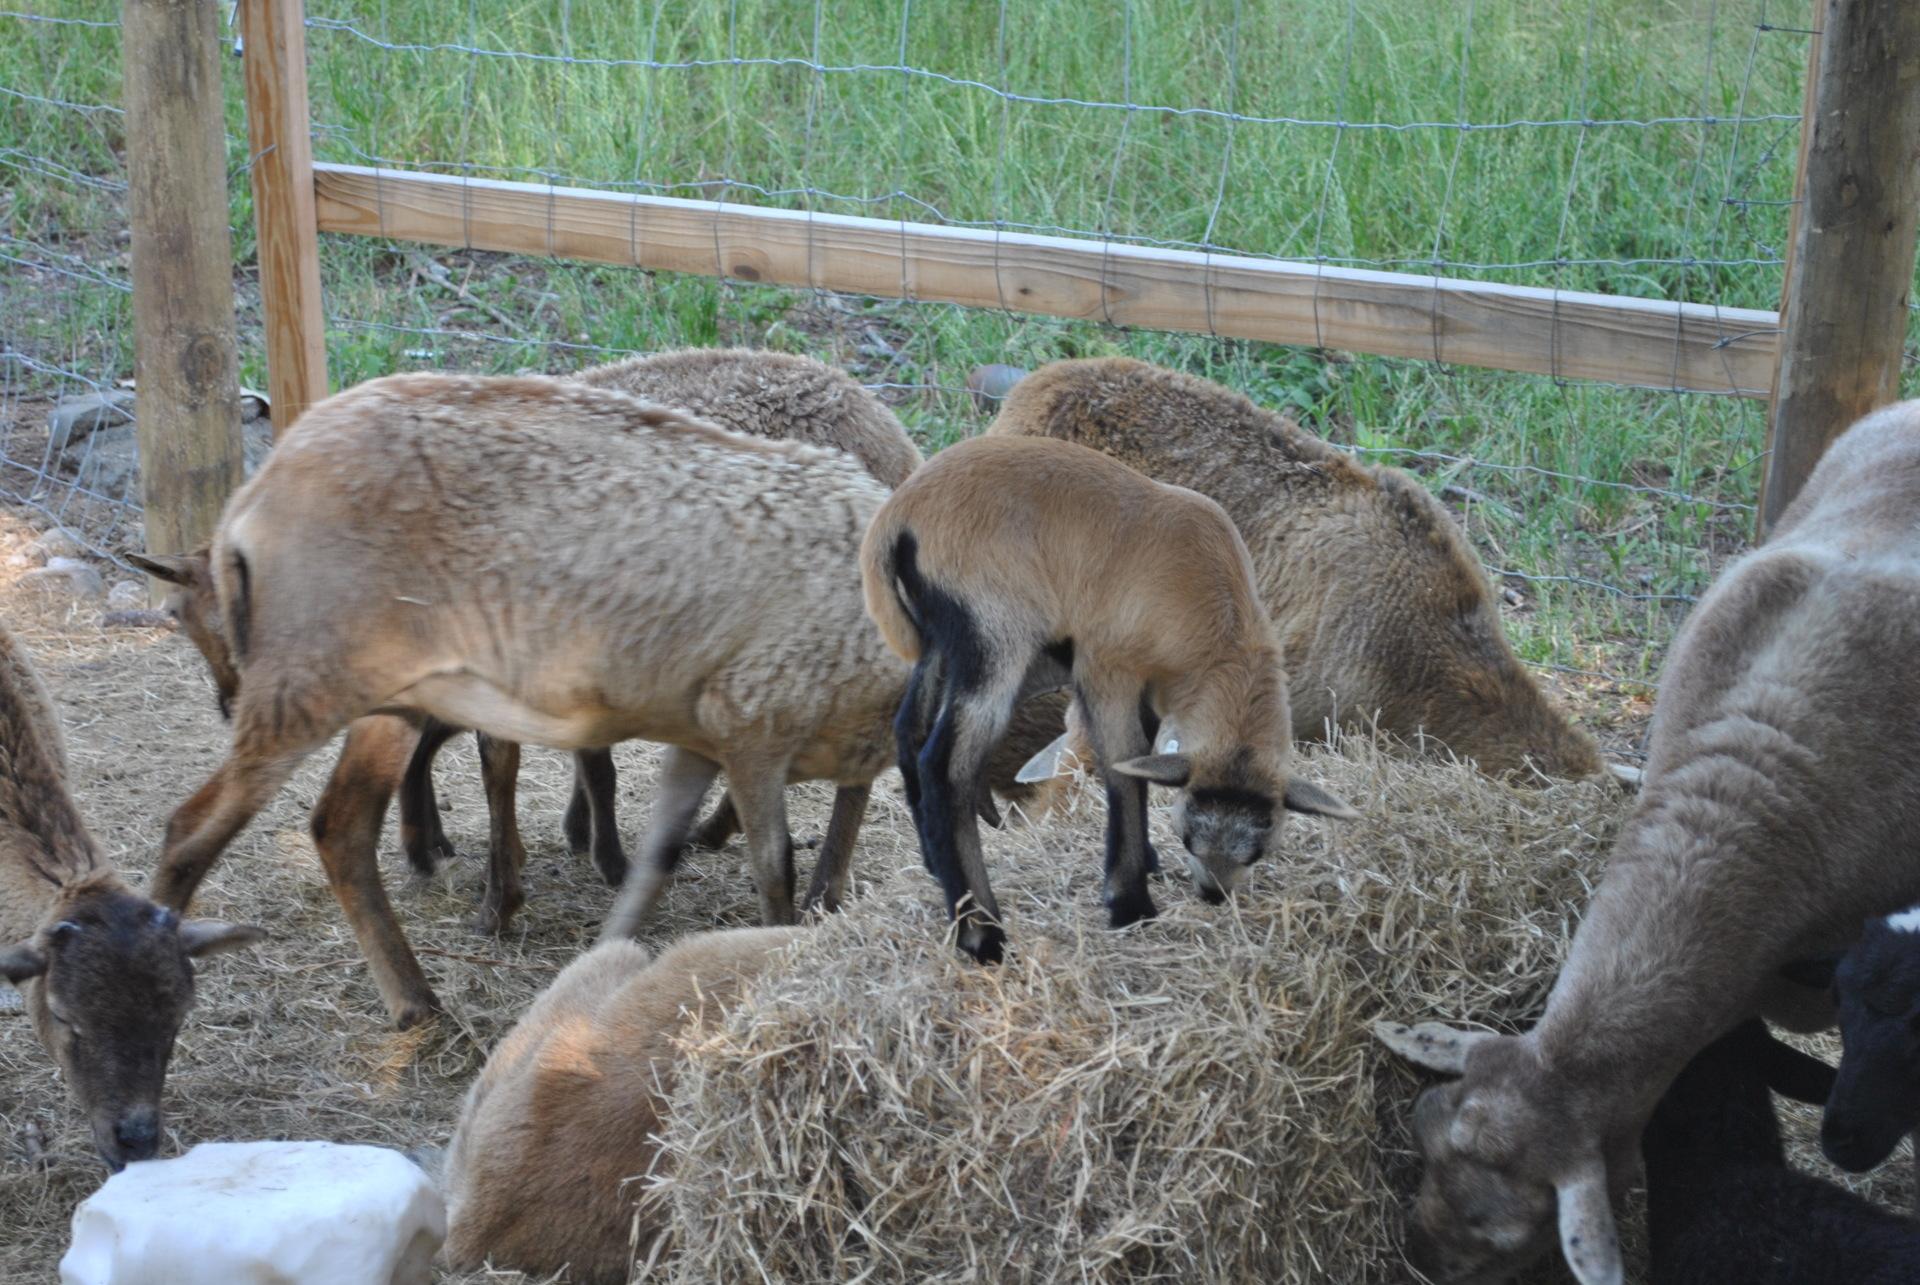 Sheep love Hay